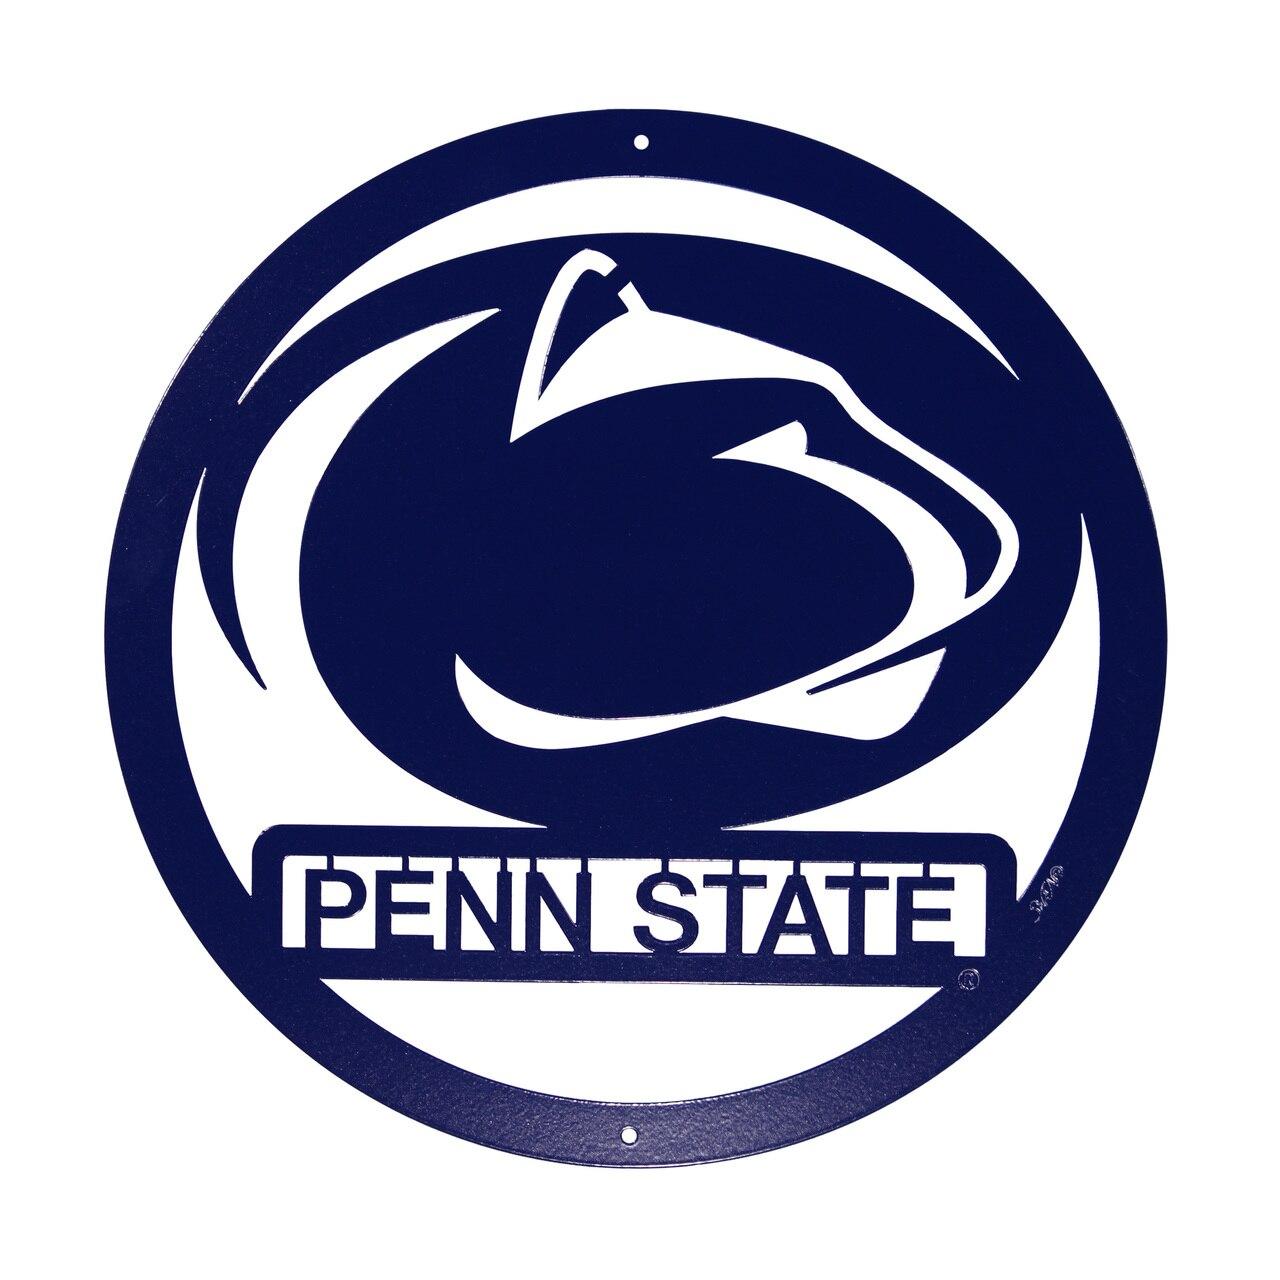 PENN STATE NITTANY LIONS Collegiate Logo Metal Wall Art Decor.